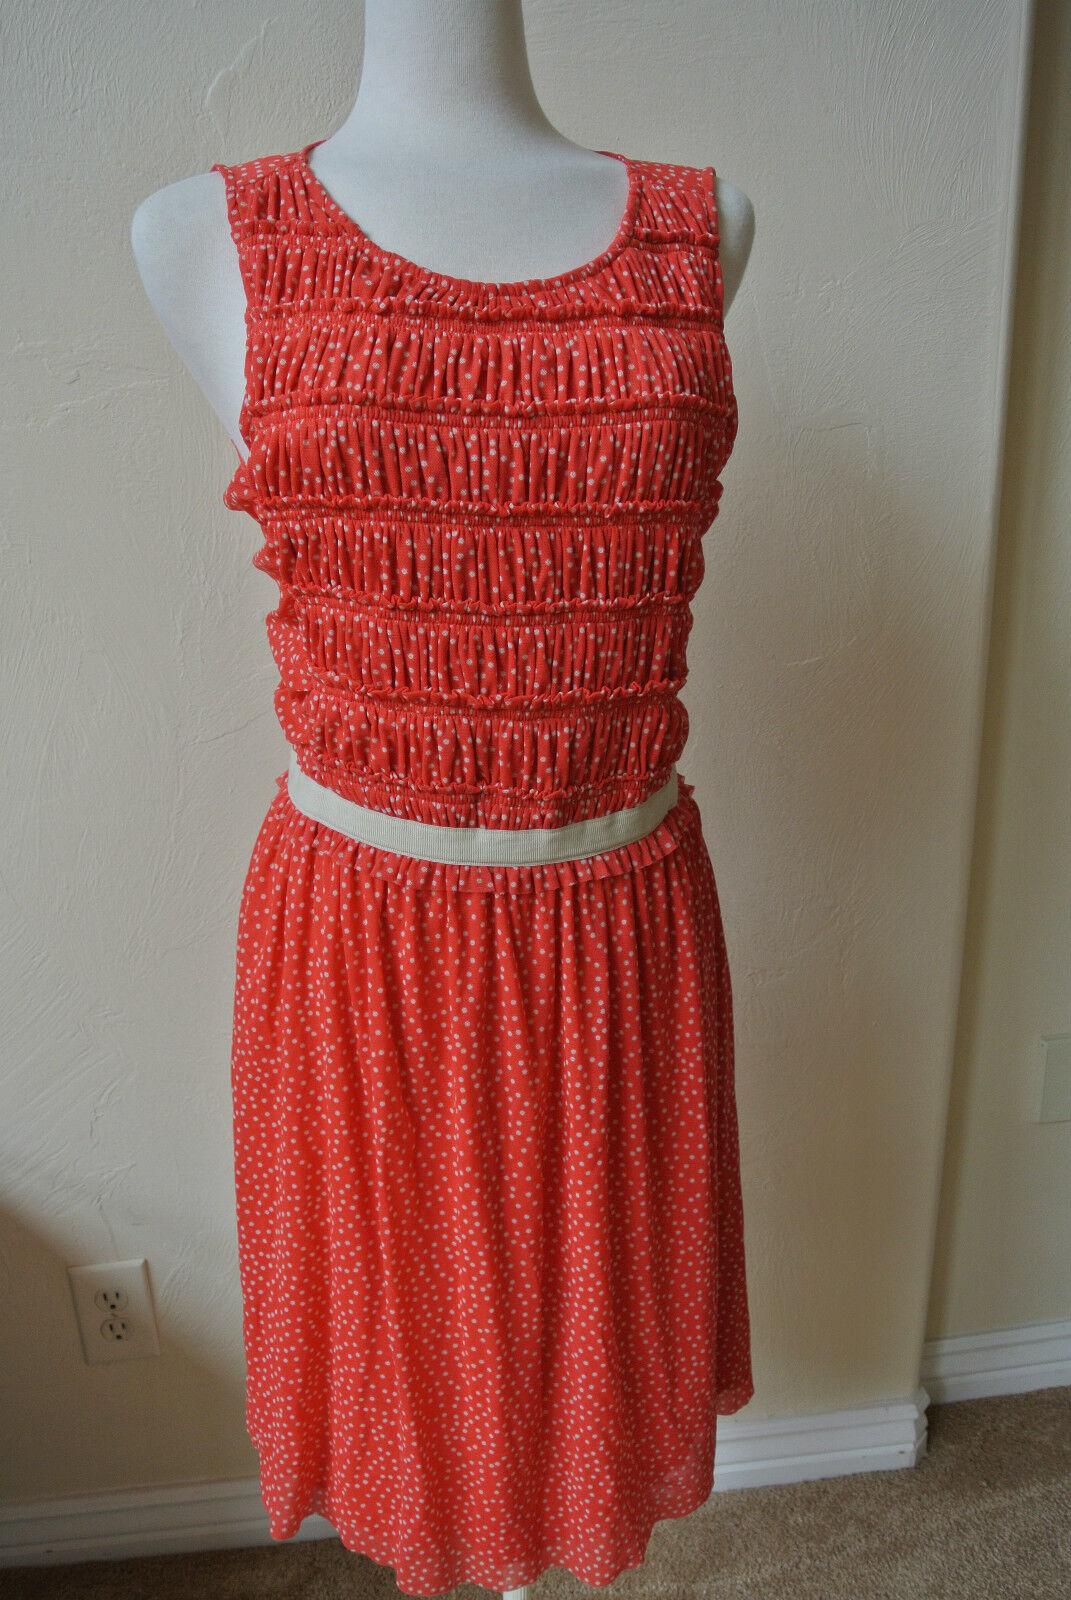 b1b8fb085807 ANTHROPOLOGIE 9 H15 STCL Postmark Orangish Red Mesh Swiss Dots Dress L NWOT